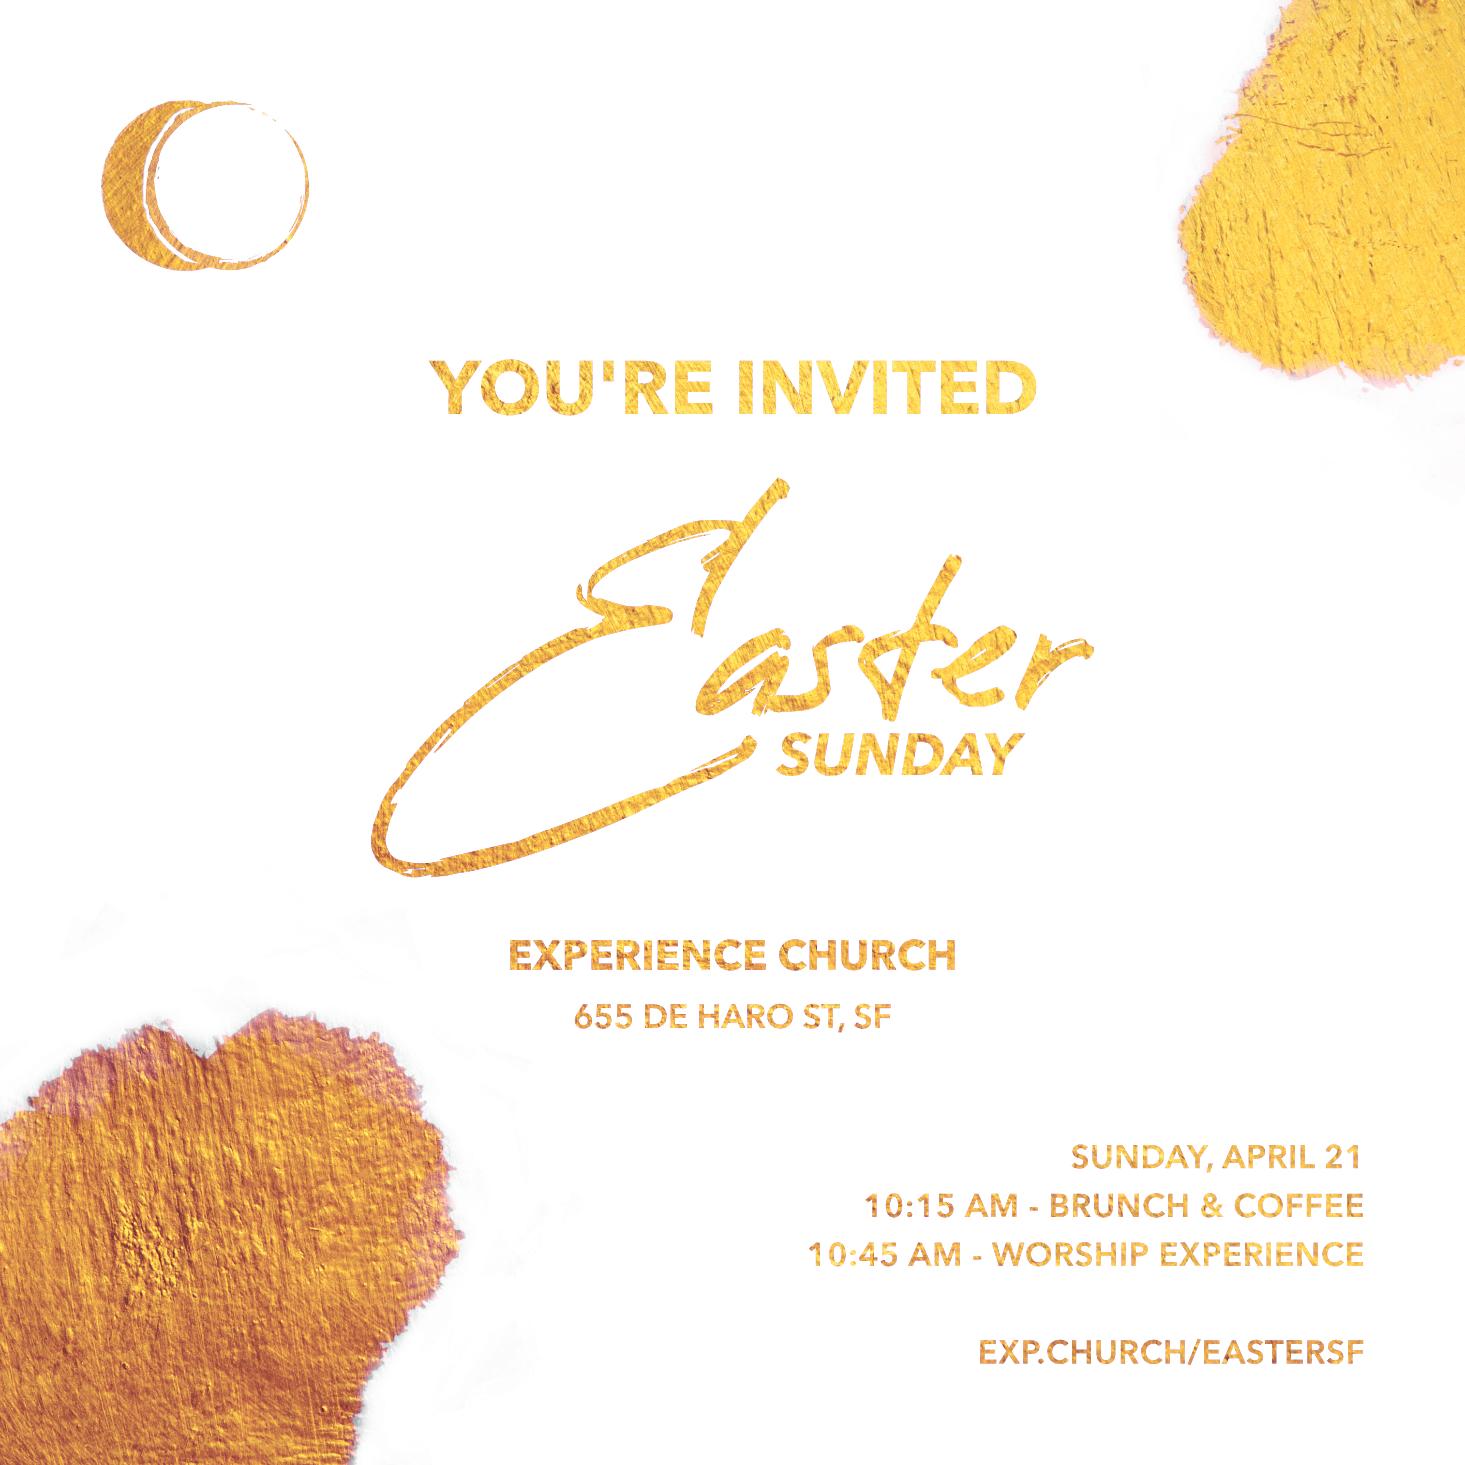 Easter_Sunday_Church_SanFrancisco_ExperienceChurch